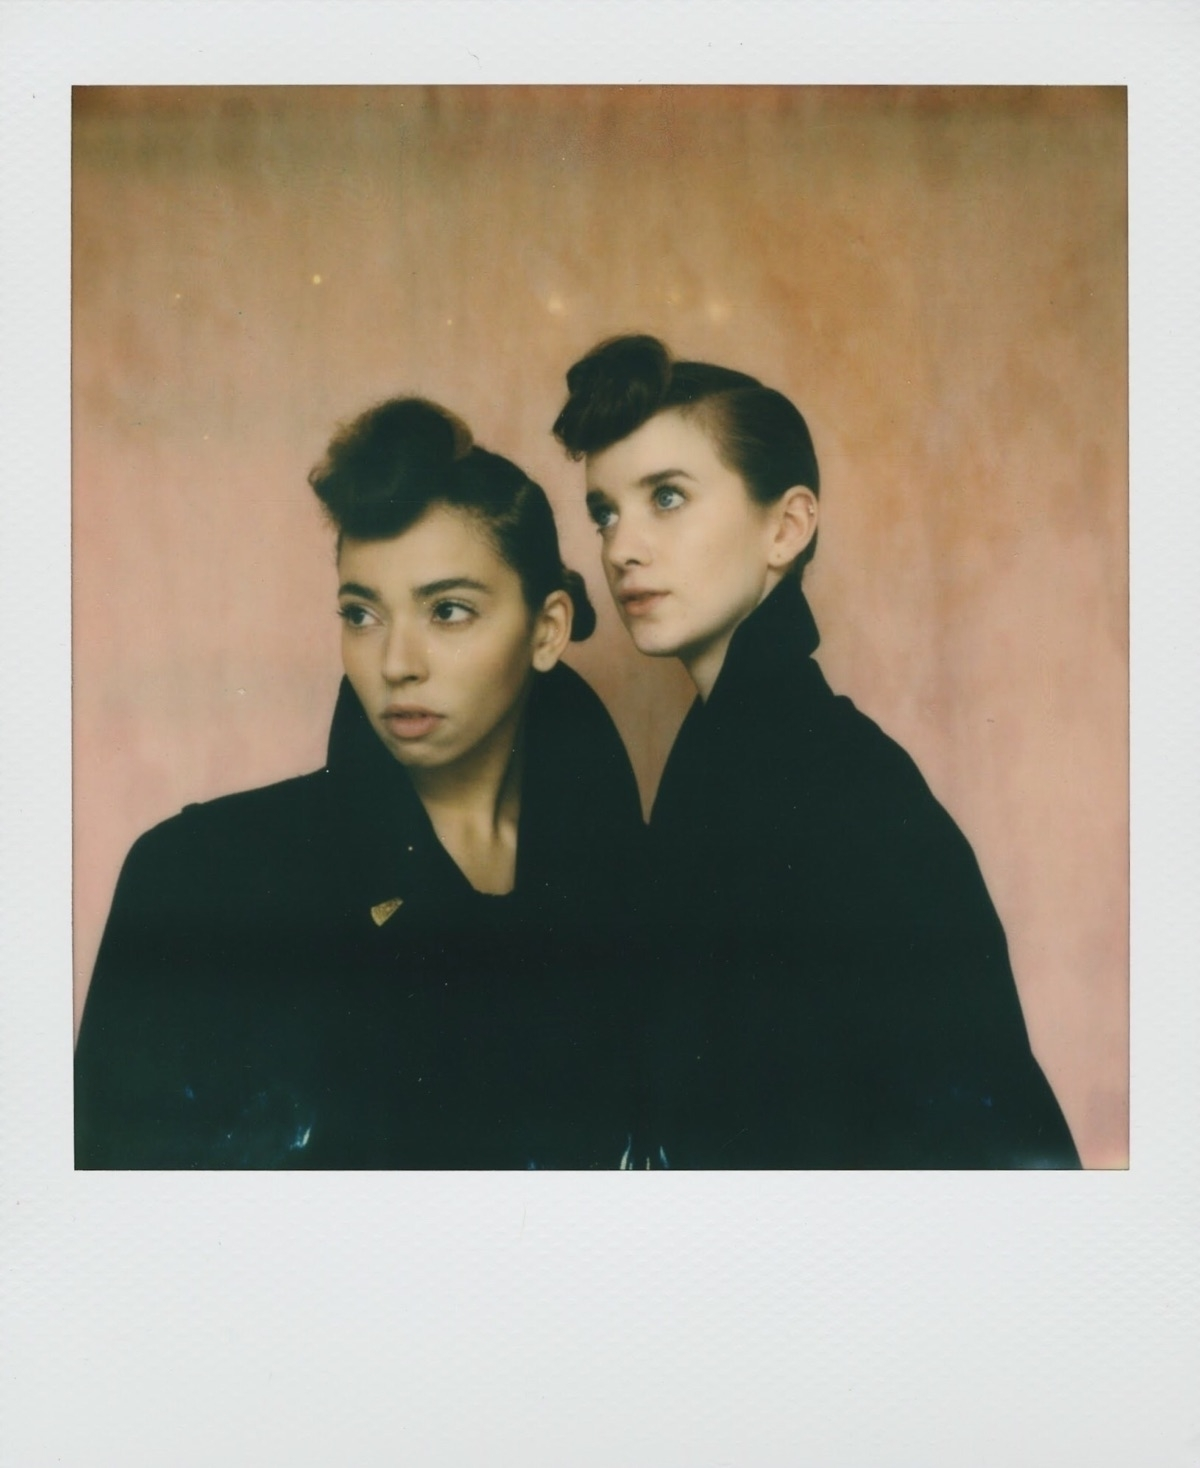 Polaroid, polaroidoriginals - _micaela | ello